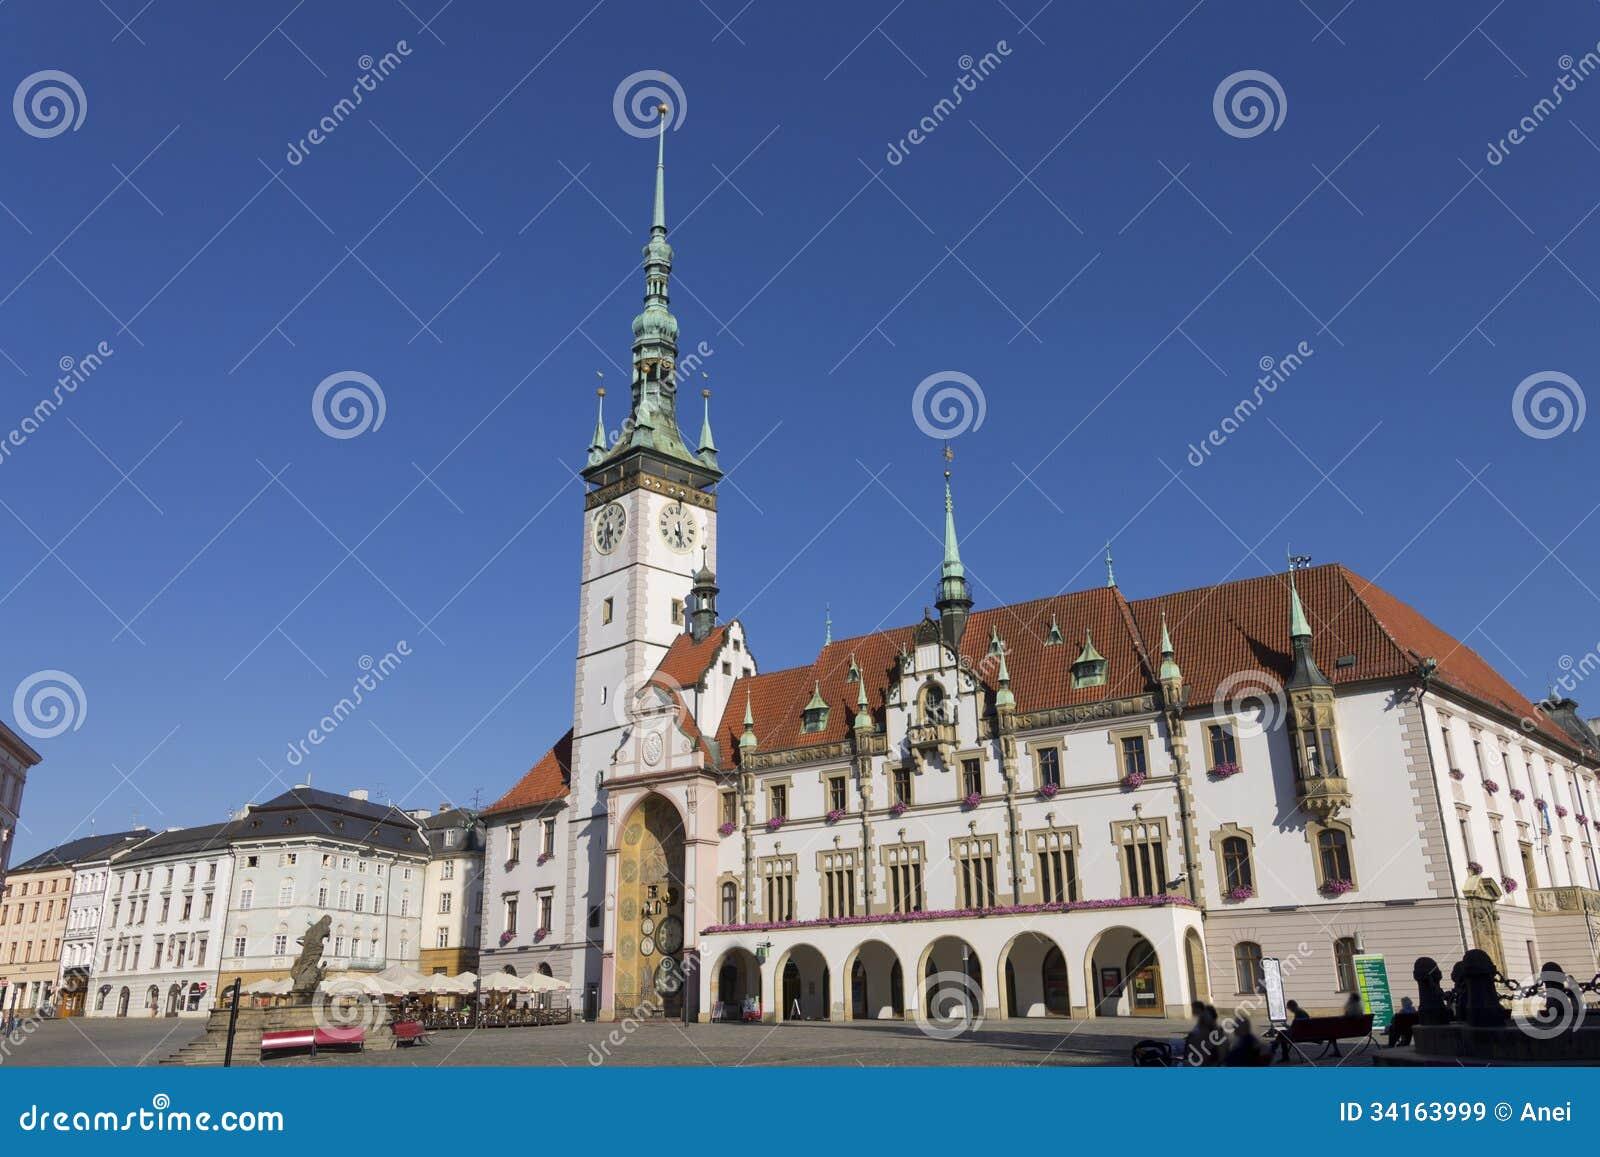 Panorama Of Olomouc City, Czech Republic Royalty-Free ...